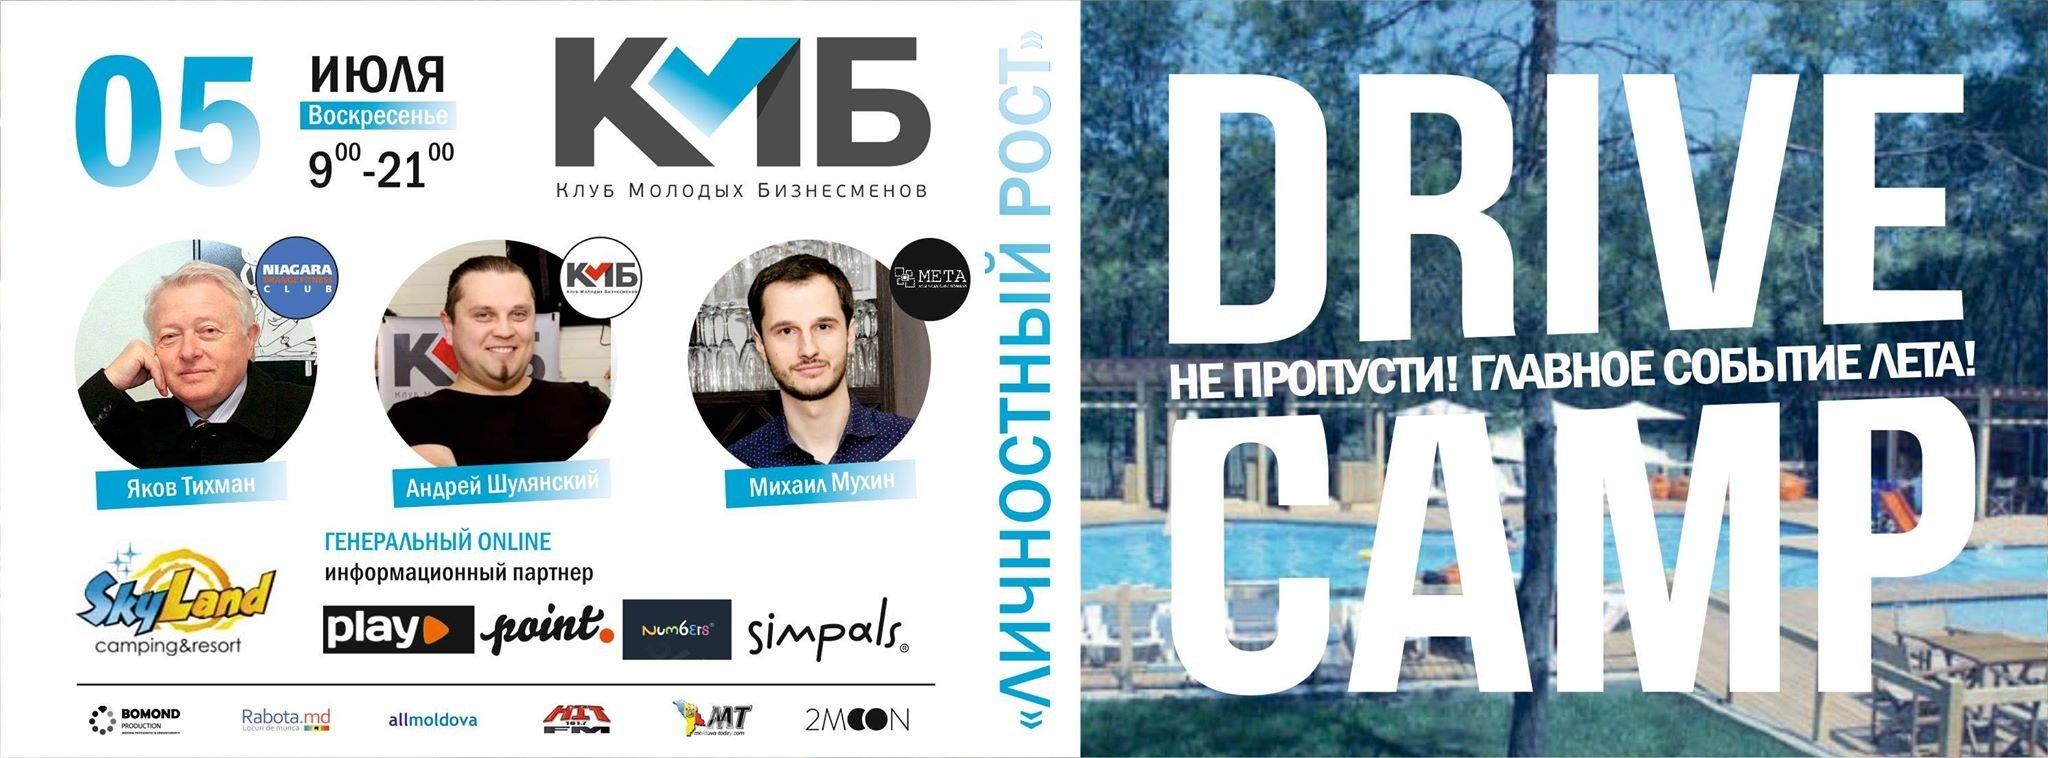 DRIVE CAMP 2015: ЛИЧНОСТНЫЙ РОСТ